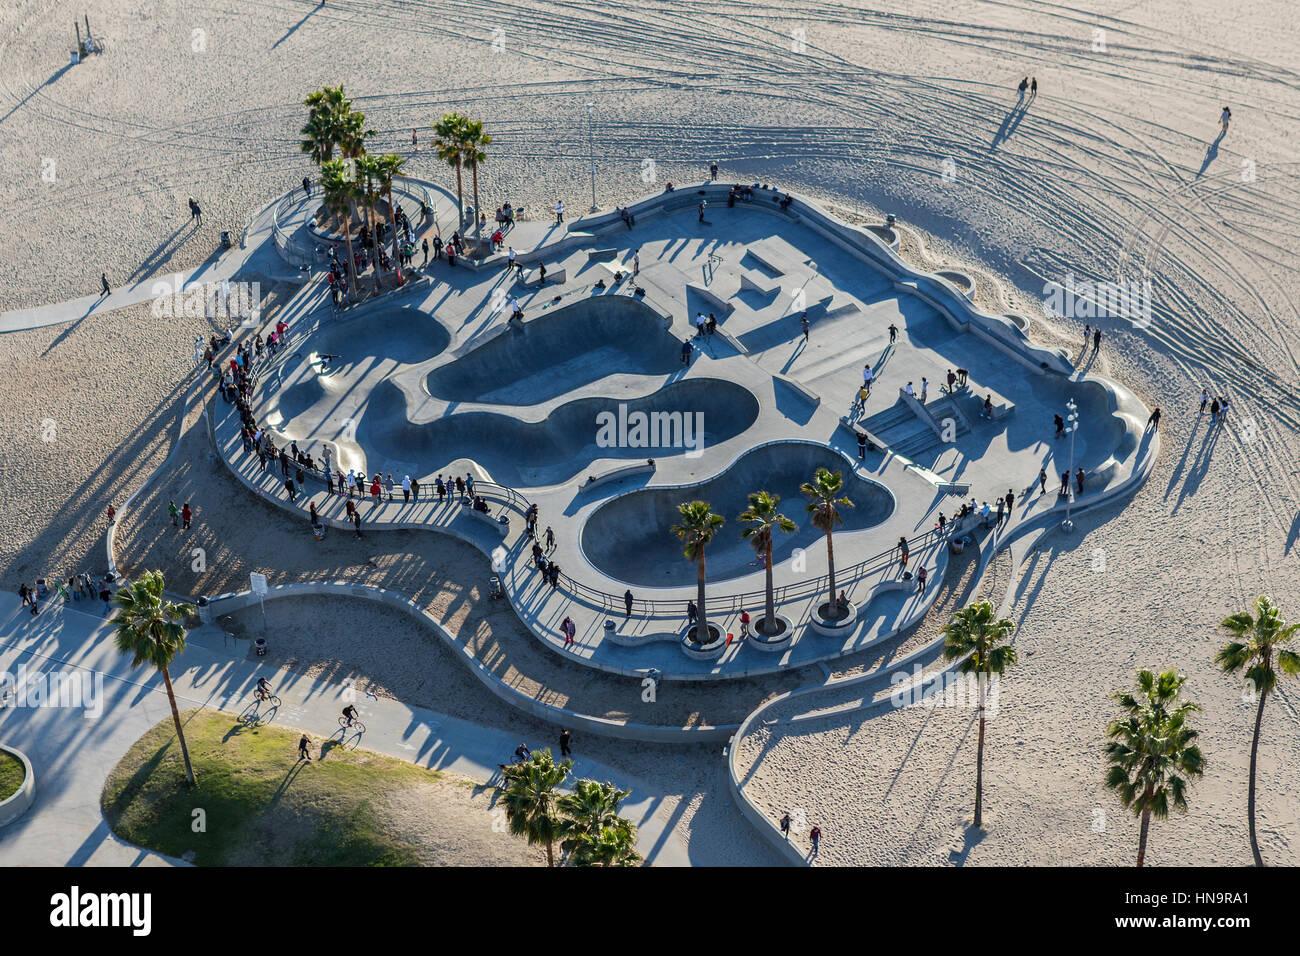 Los Angeles, Kalifornien, USA - 17. Dezember 2016: Antenne des beliebten Skateboard-Park am Venice Beach in Süd Stockbild